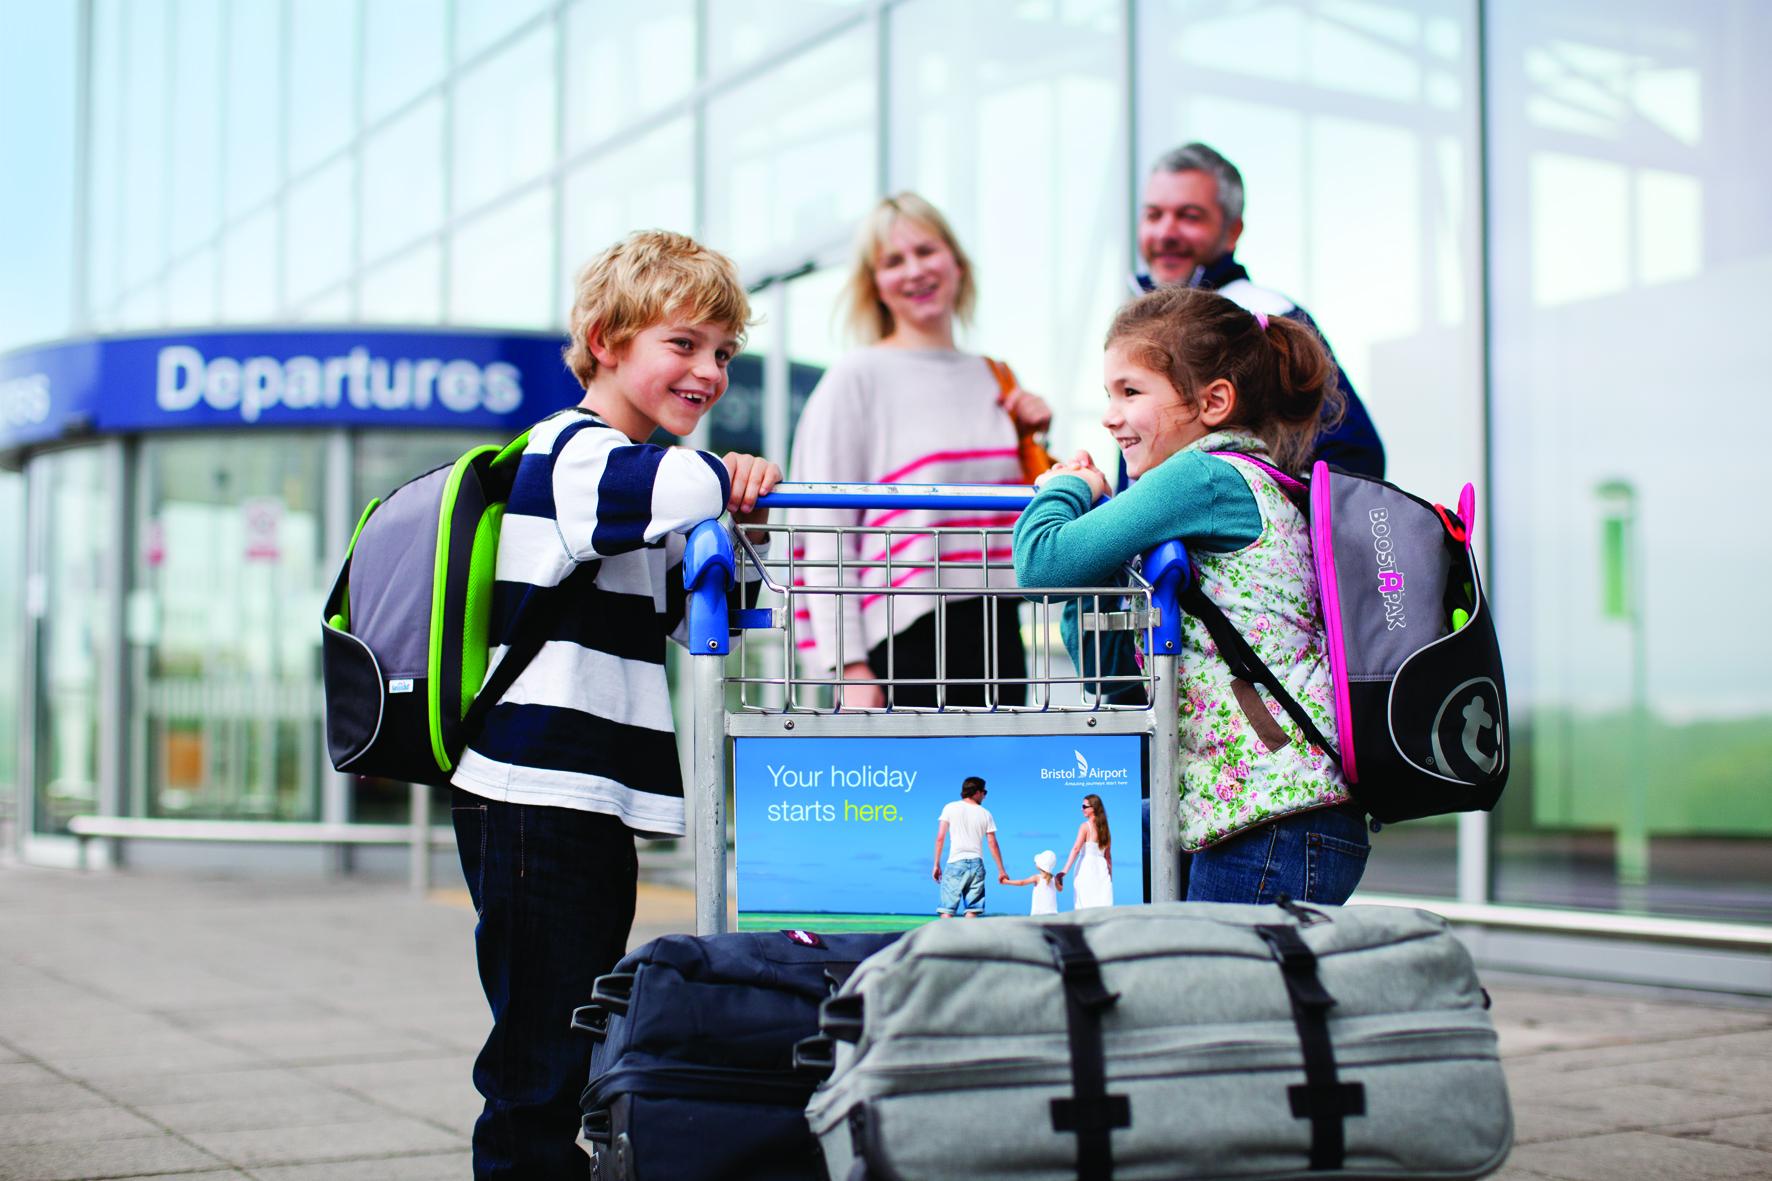 939_airport_boostapak_trolley